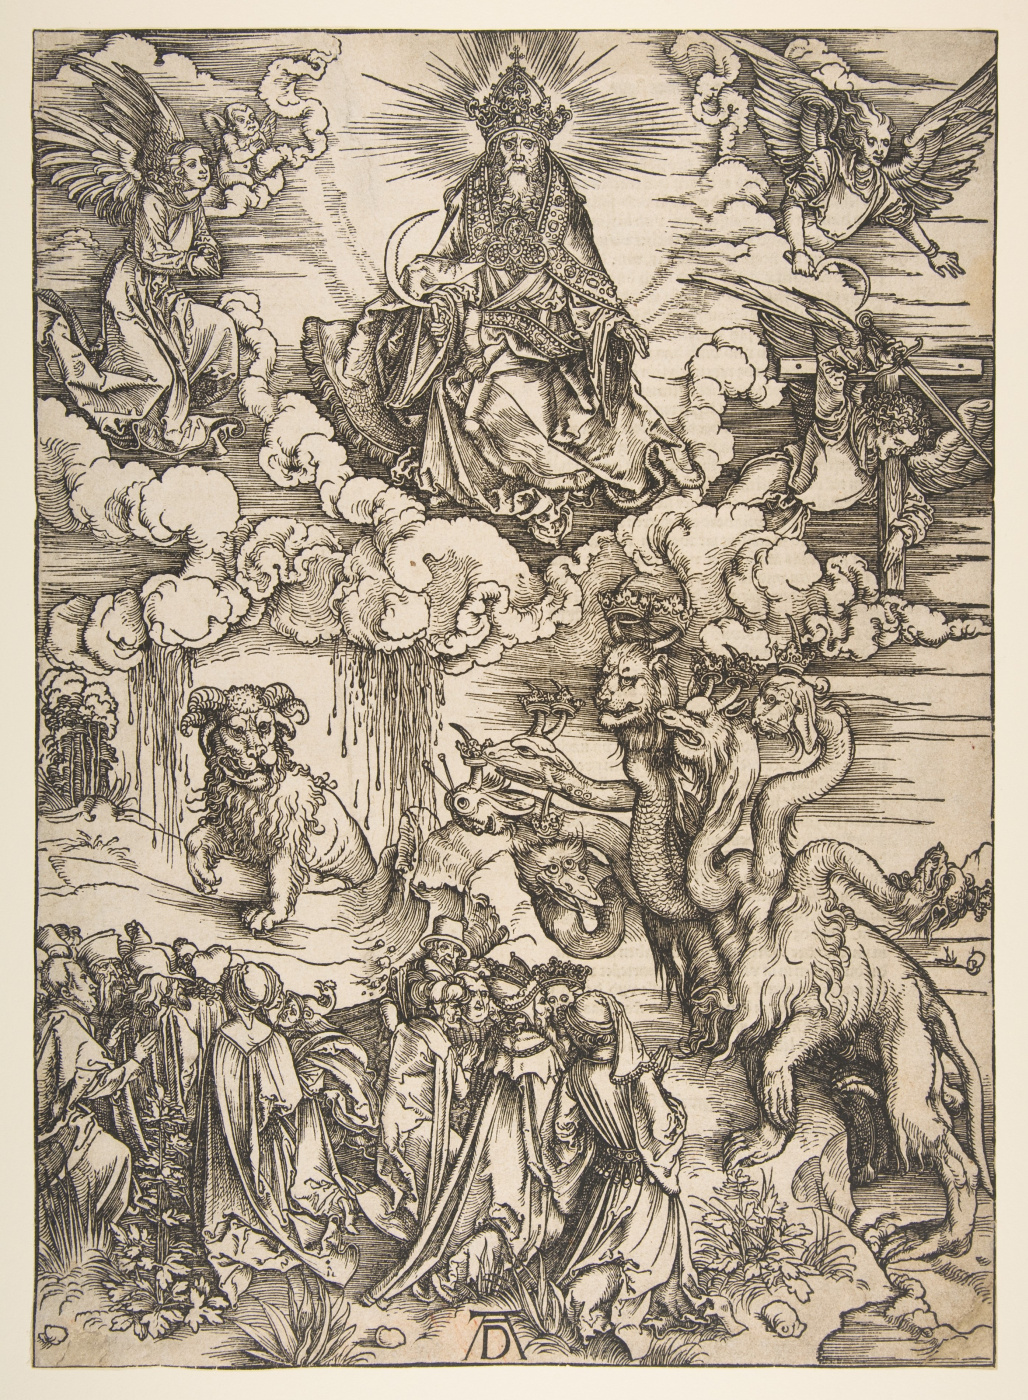 Albrecht Durer. The seven-headed dragon and the horned beast